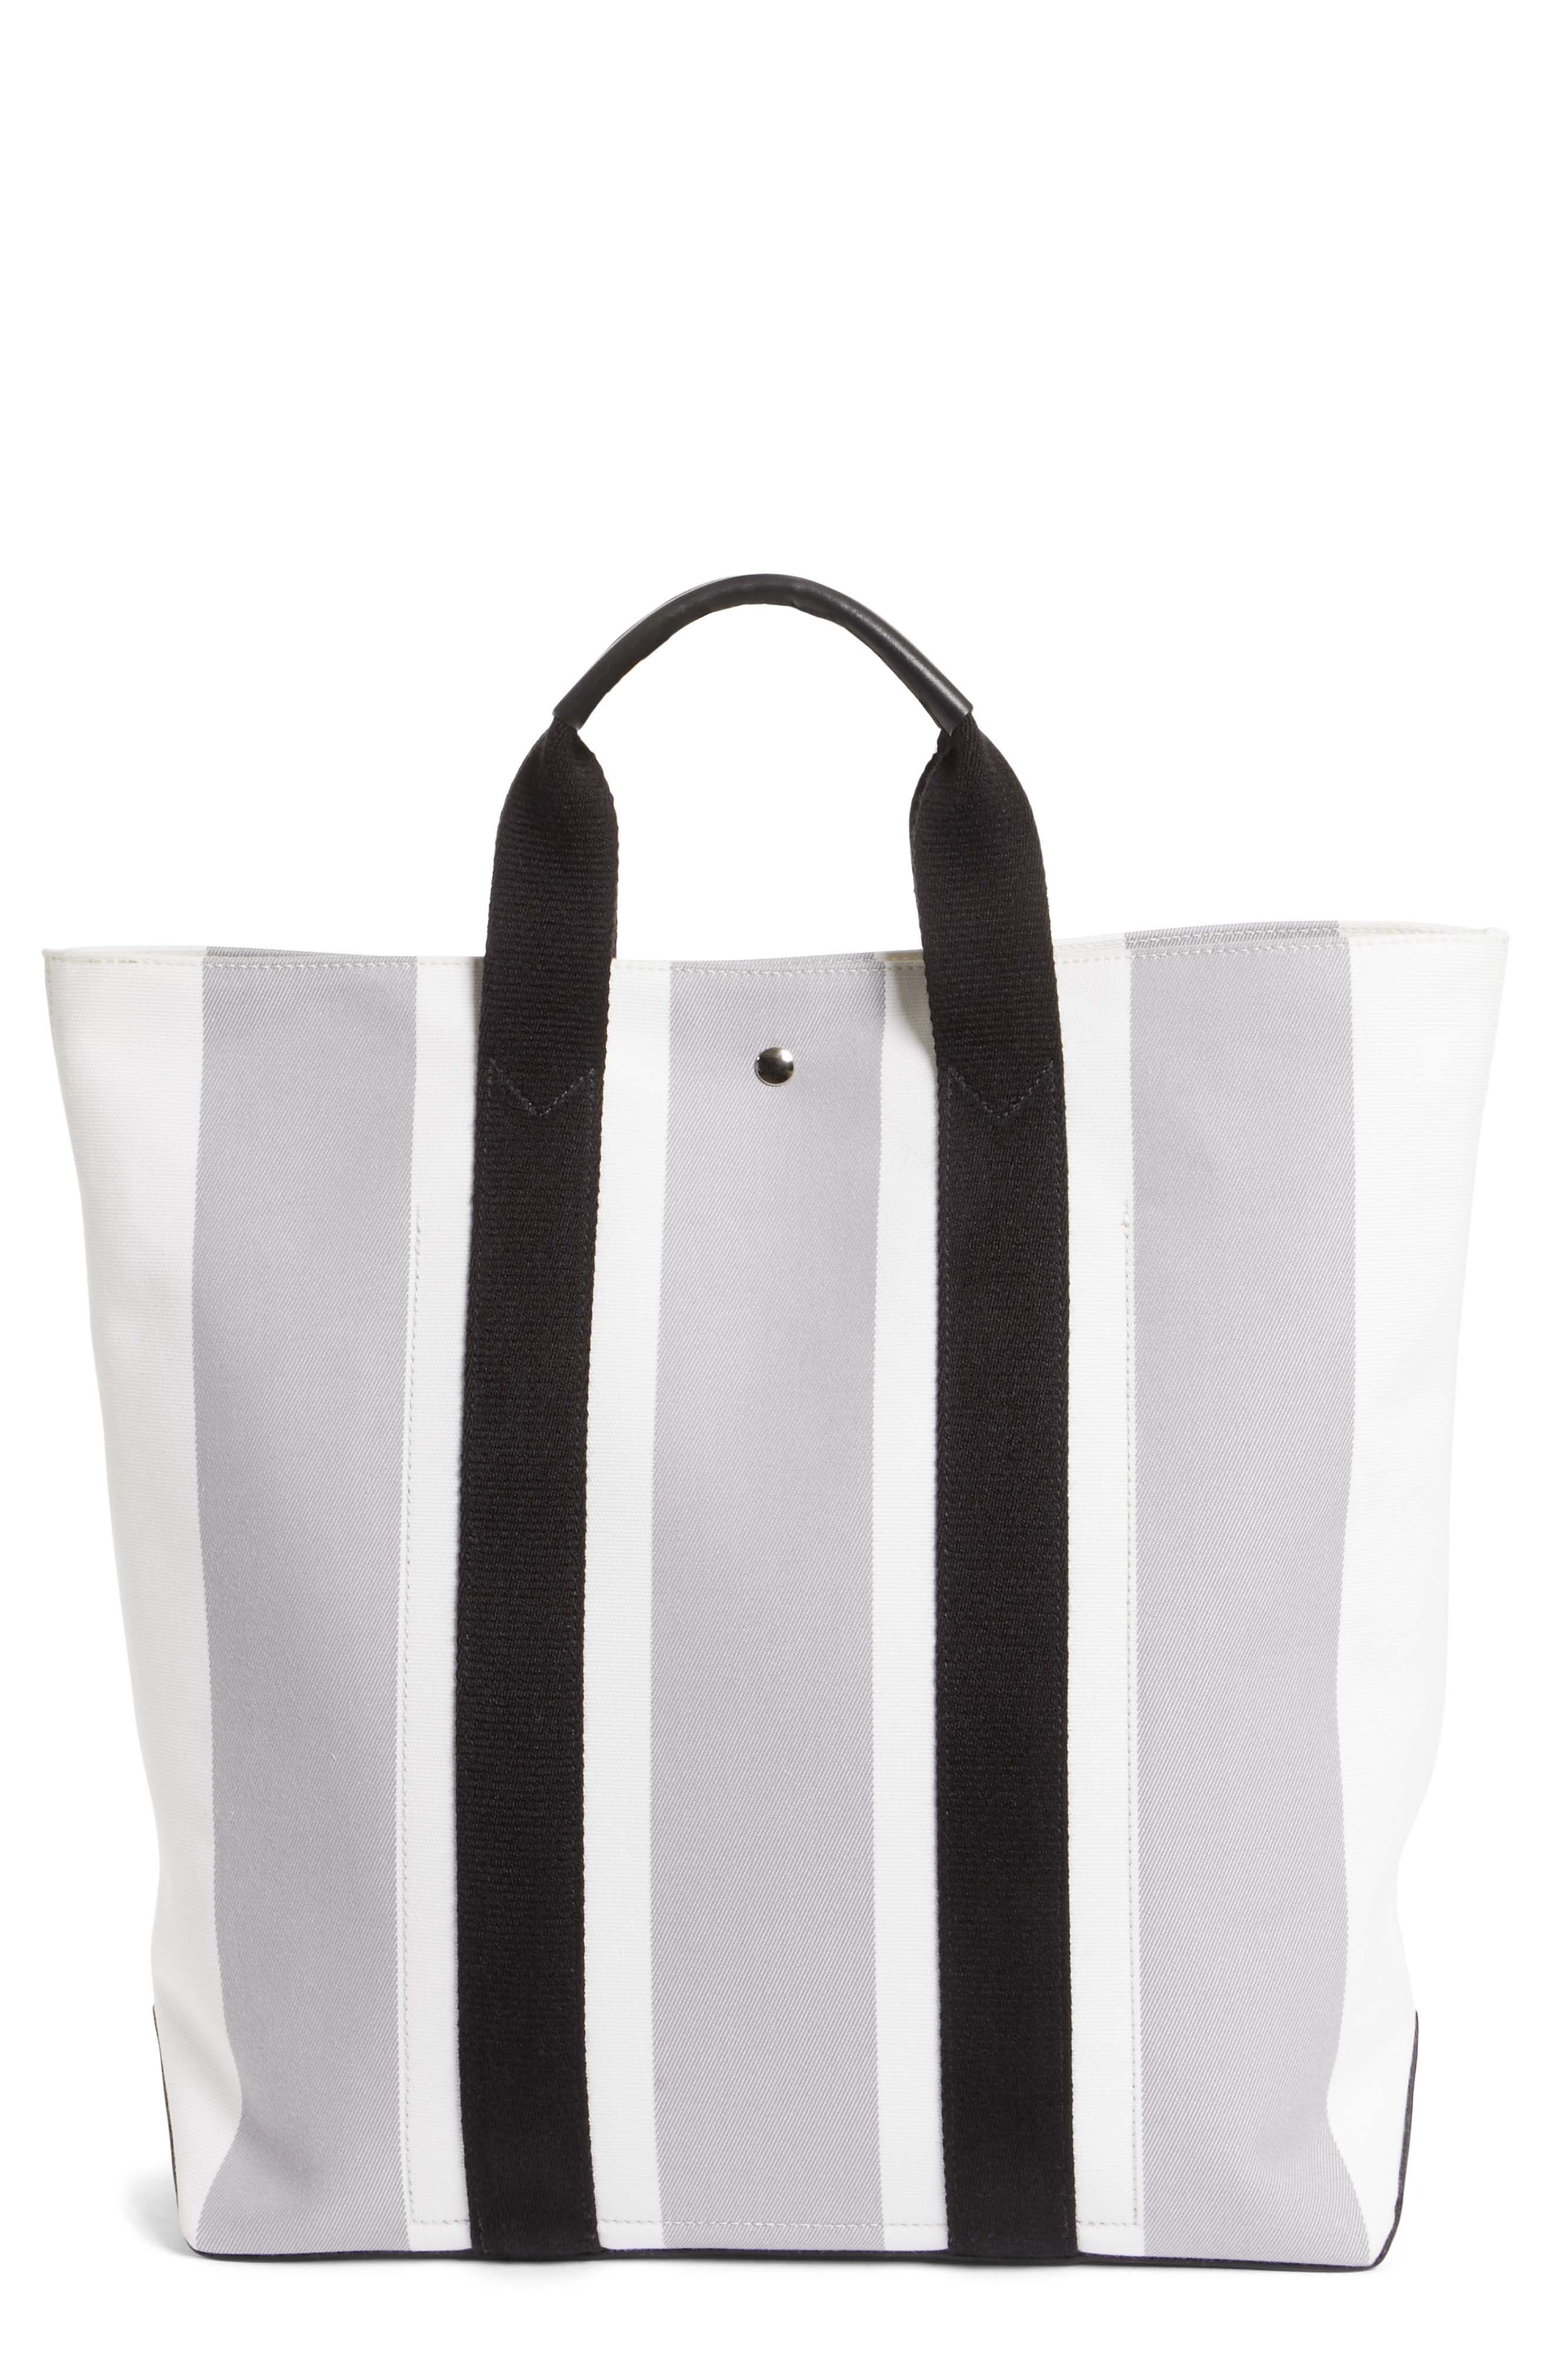 Stripe Canvas Tote,                             Main thumbnail 1, color,                             White/ Grey/ Black